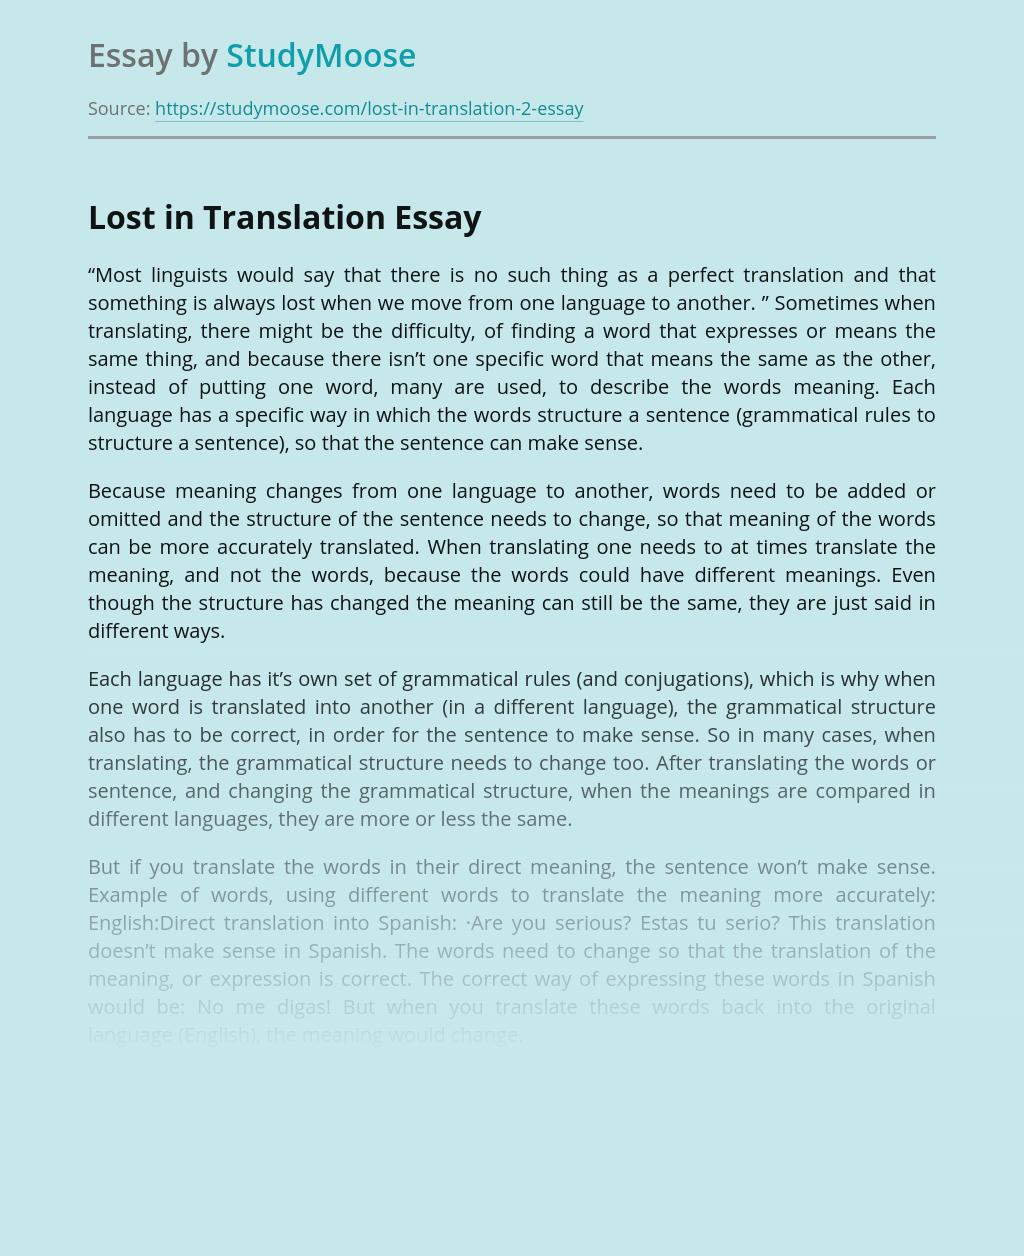 Lost in Translation - Linguistics